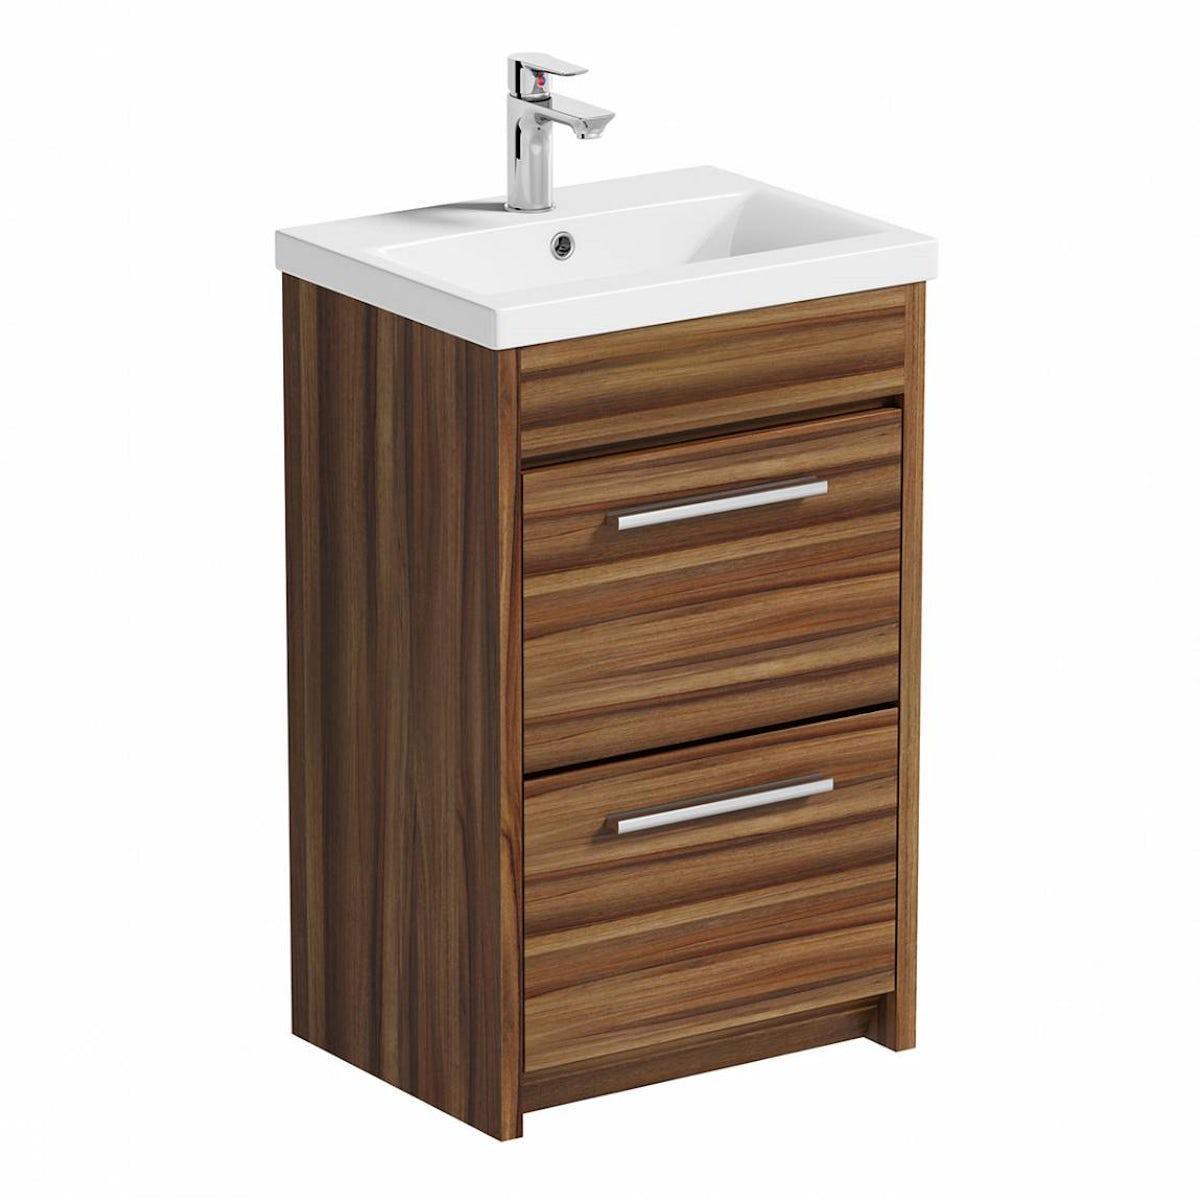 1200 vanity unit - Smart Walnut Vanity Drawer Unit With Basin 500mm